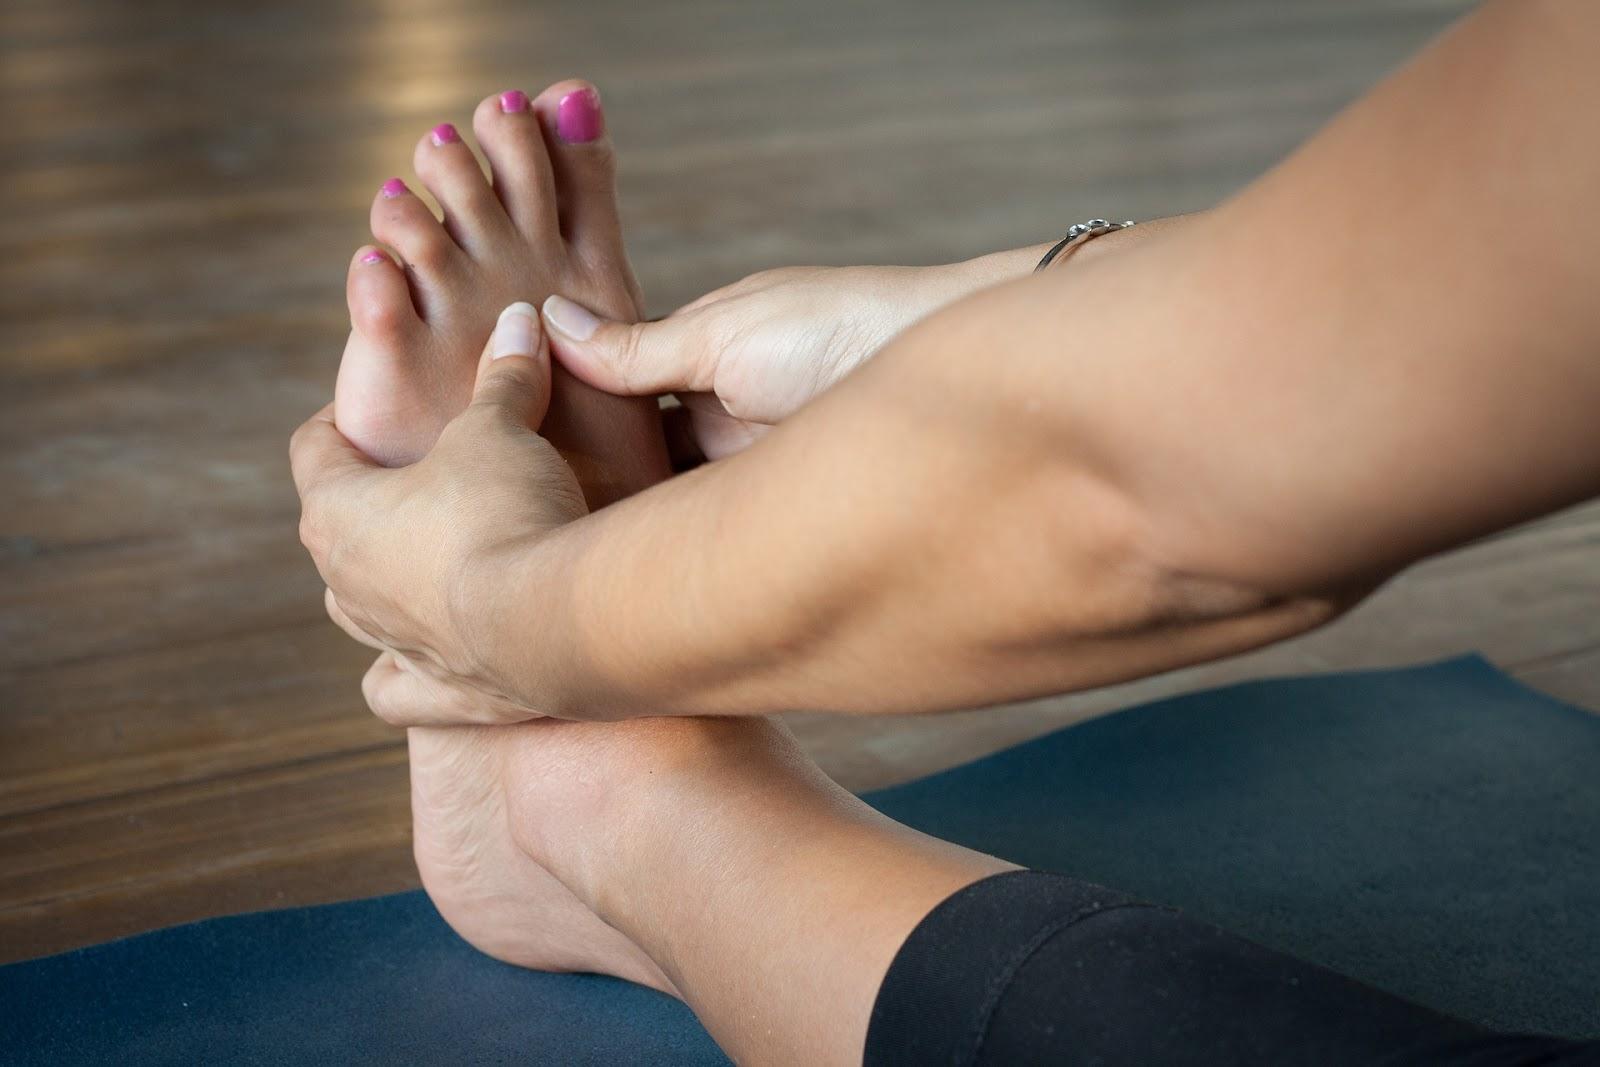 Woman massaging her own foot